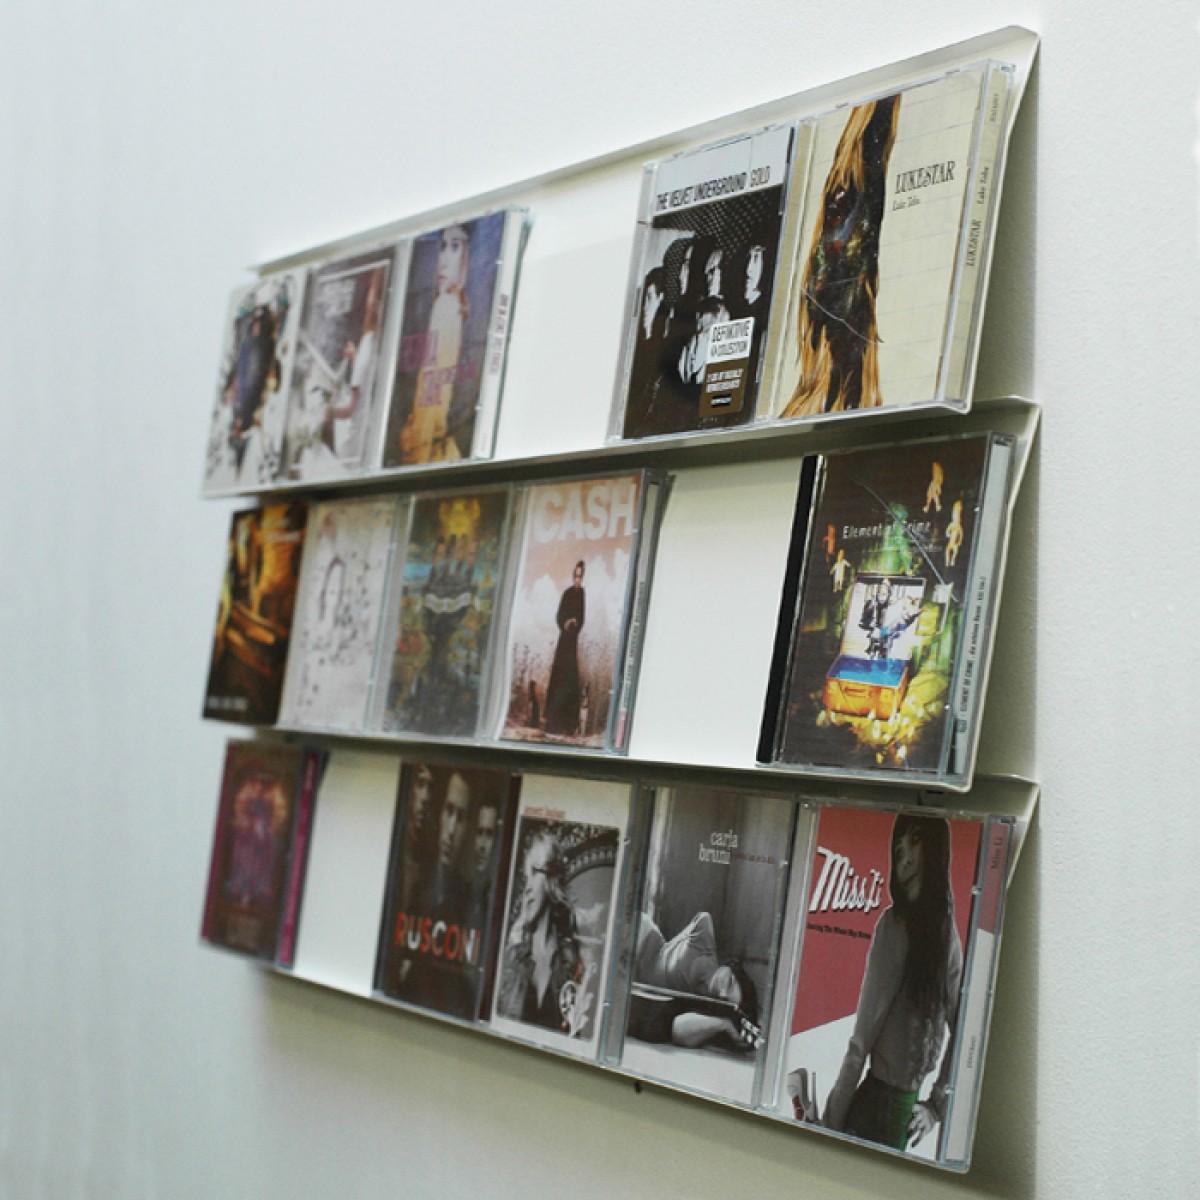 CD-Display (abgebildet sind 3 Stück)